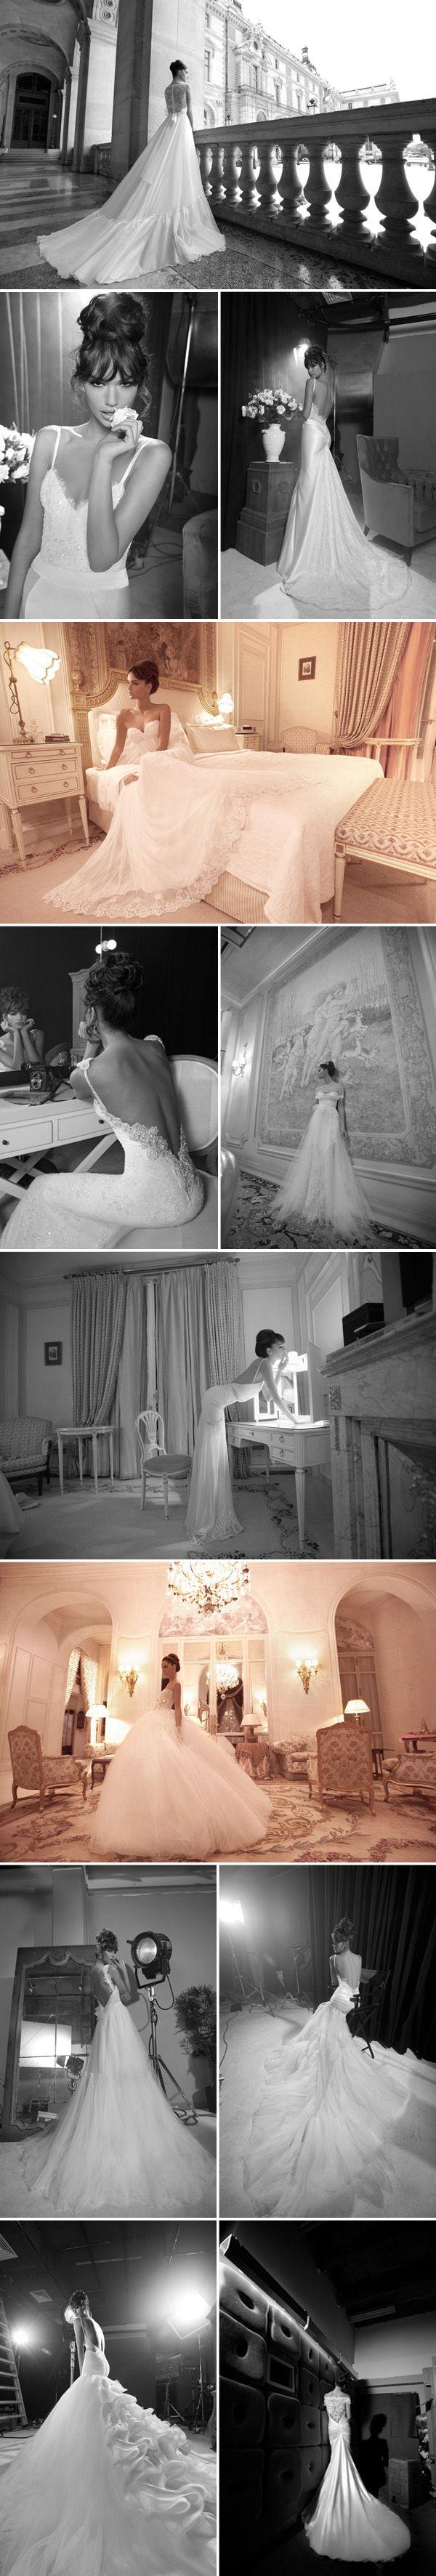 Inbal Dror: Wedding Dressses, Photo Ideas, Backless Dresses, Dreams Wedding Dresses, Luxury Wedding, Inbal Dror, Haute Couture, Couture Wedding Gowns, Dror Luxury